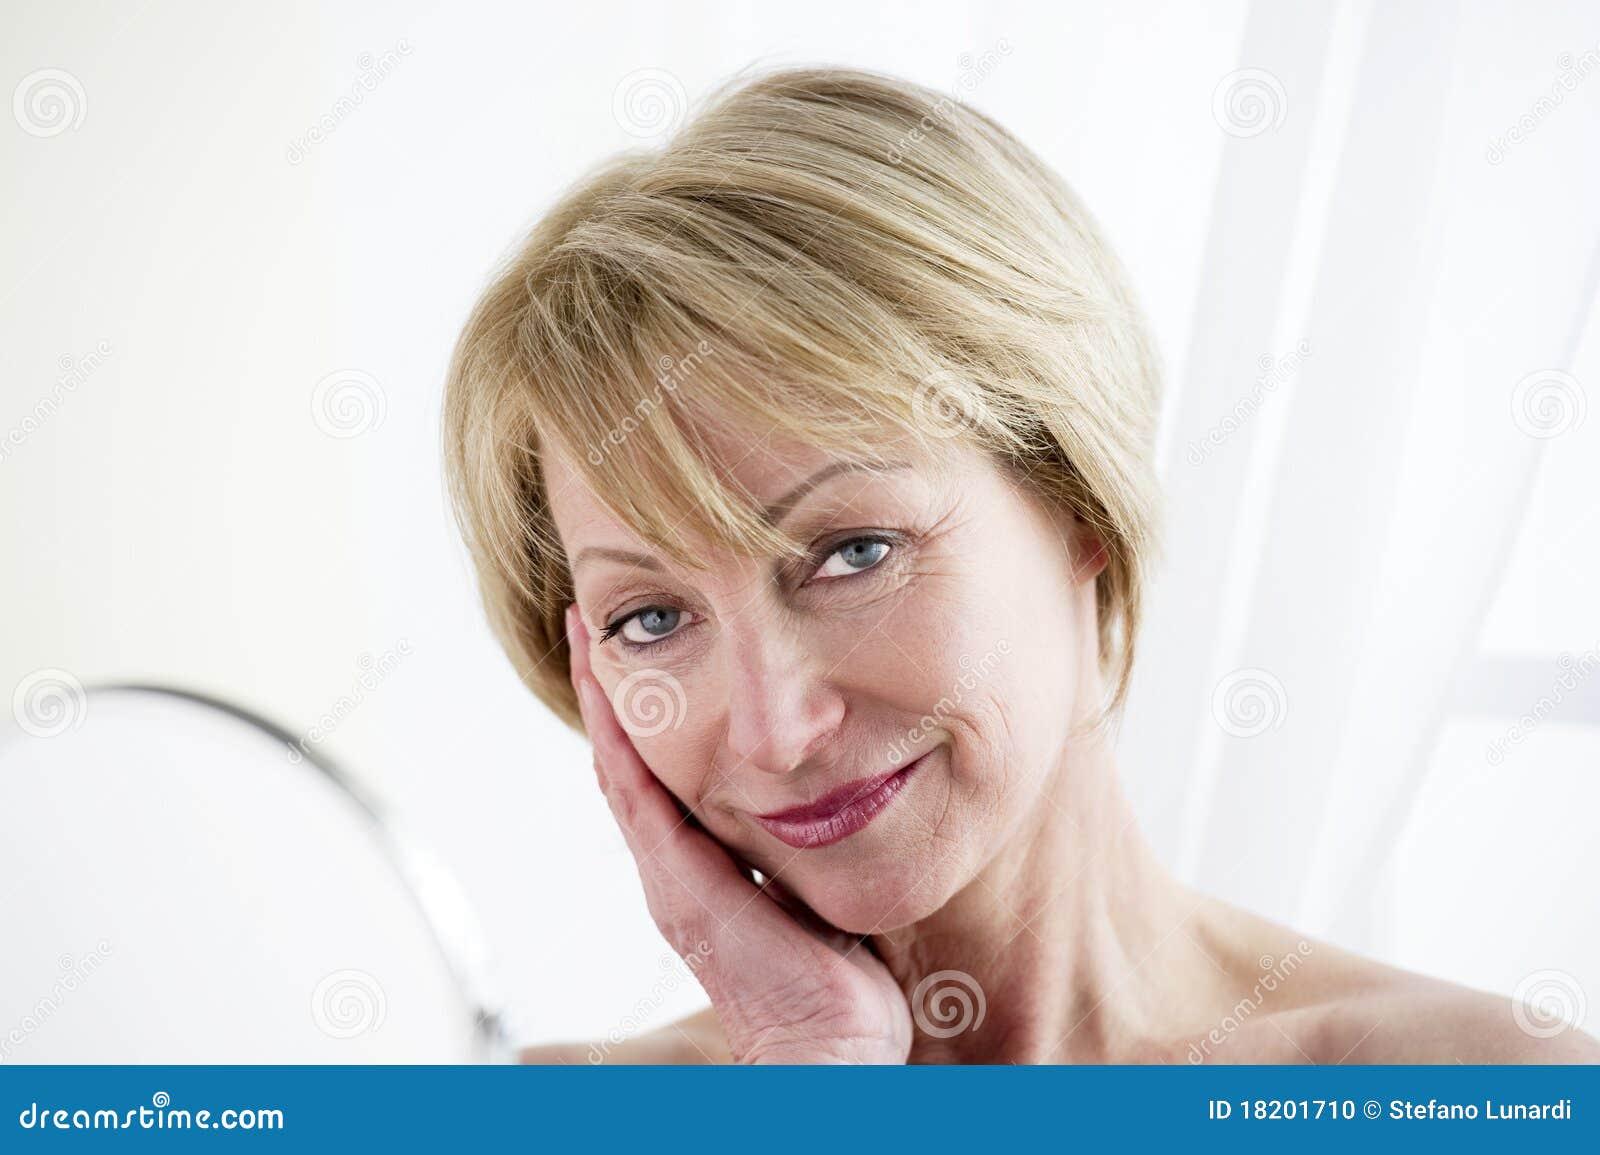 Порно с мамки онлайн, где баба отдает сынку свою киску